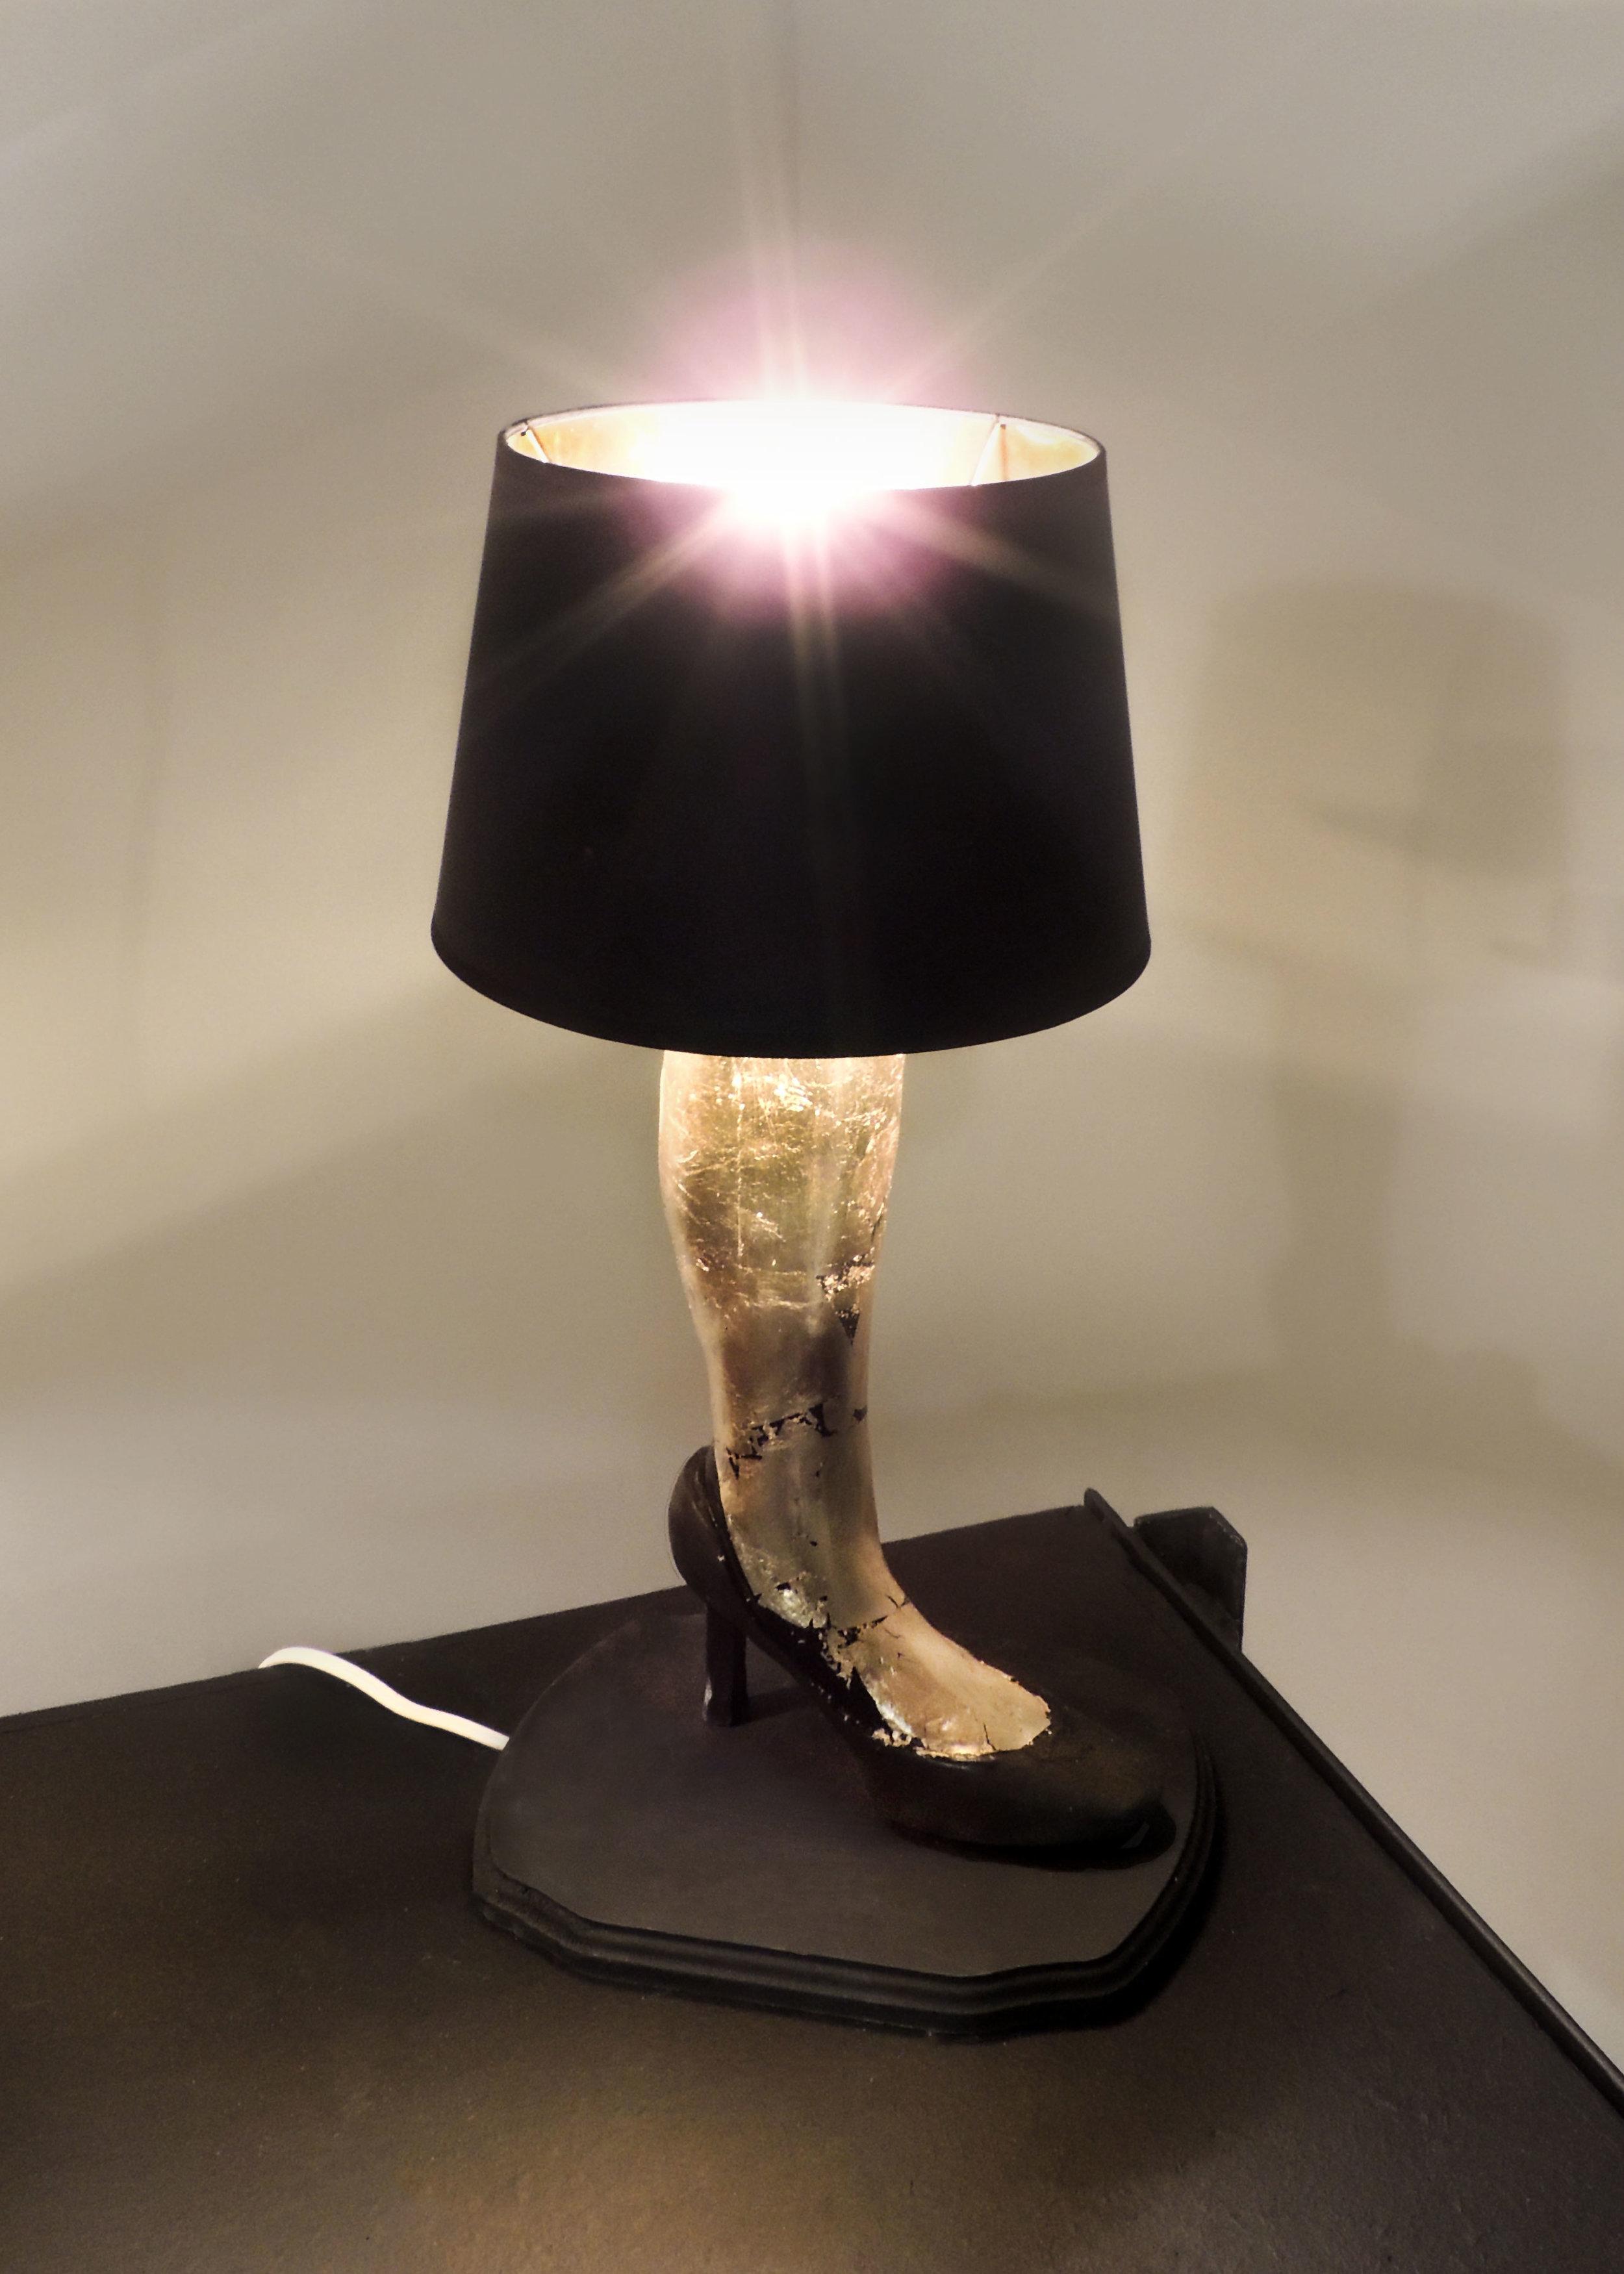 lamps04_fullres.jpg